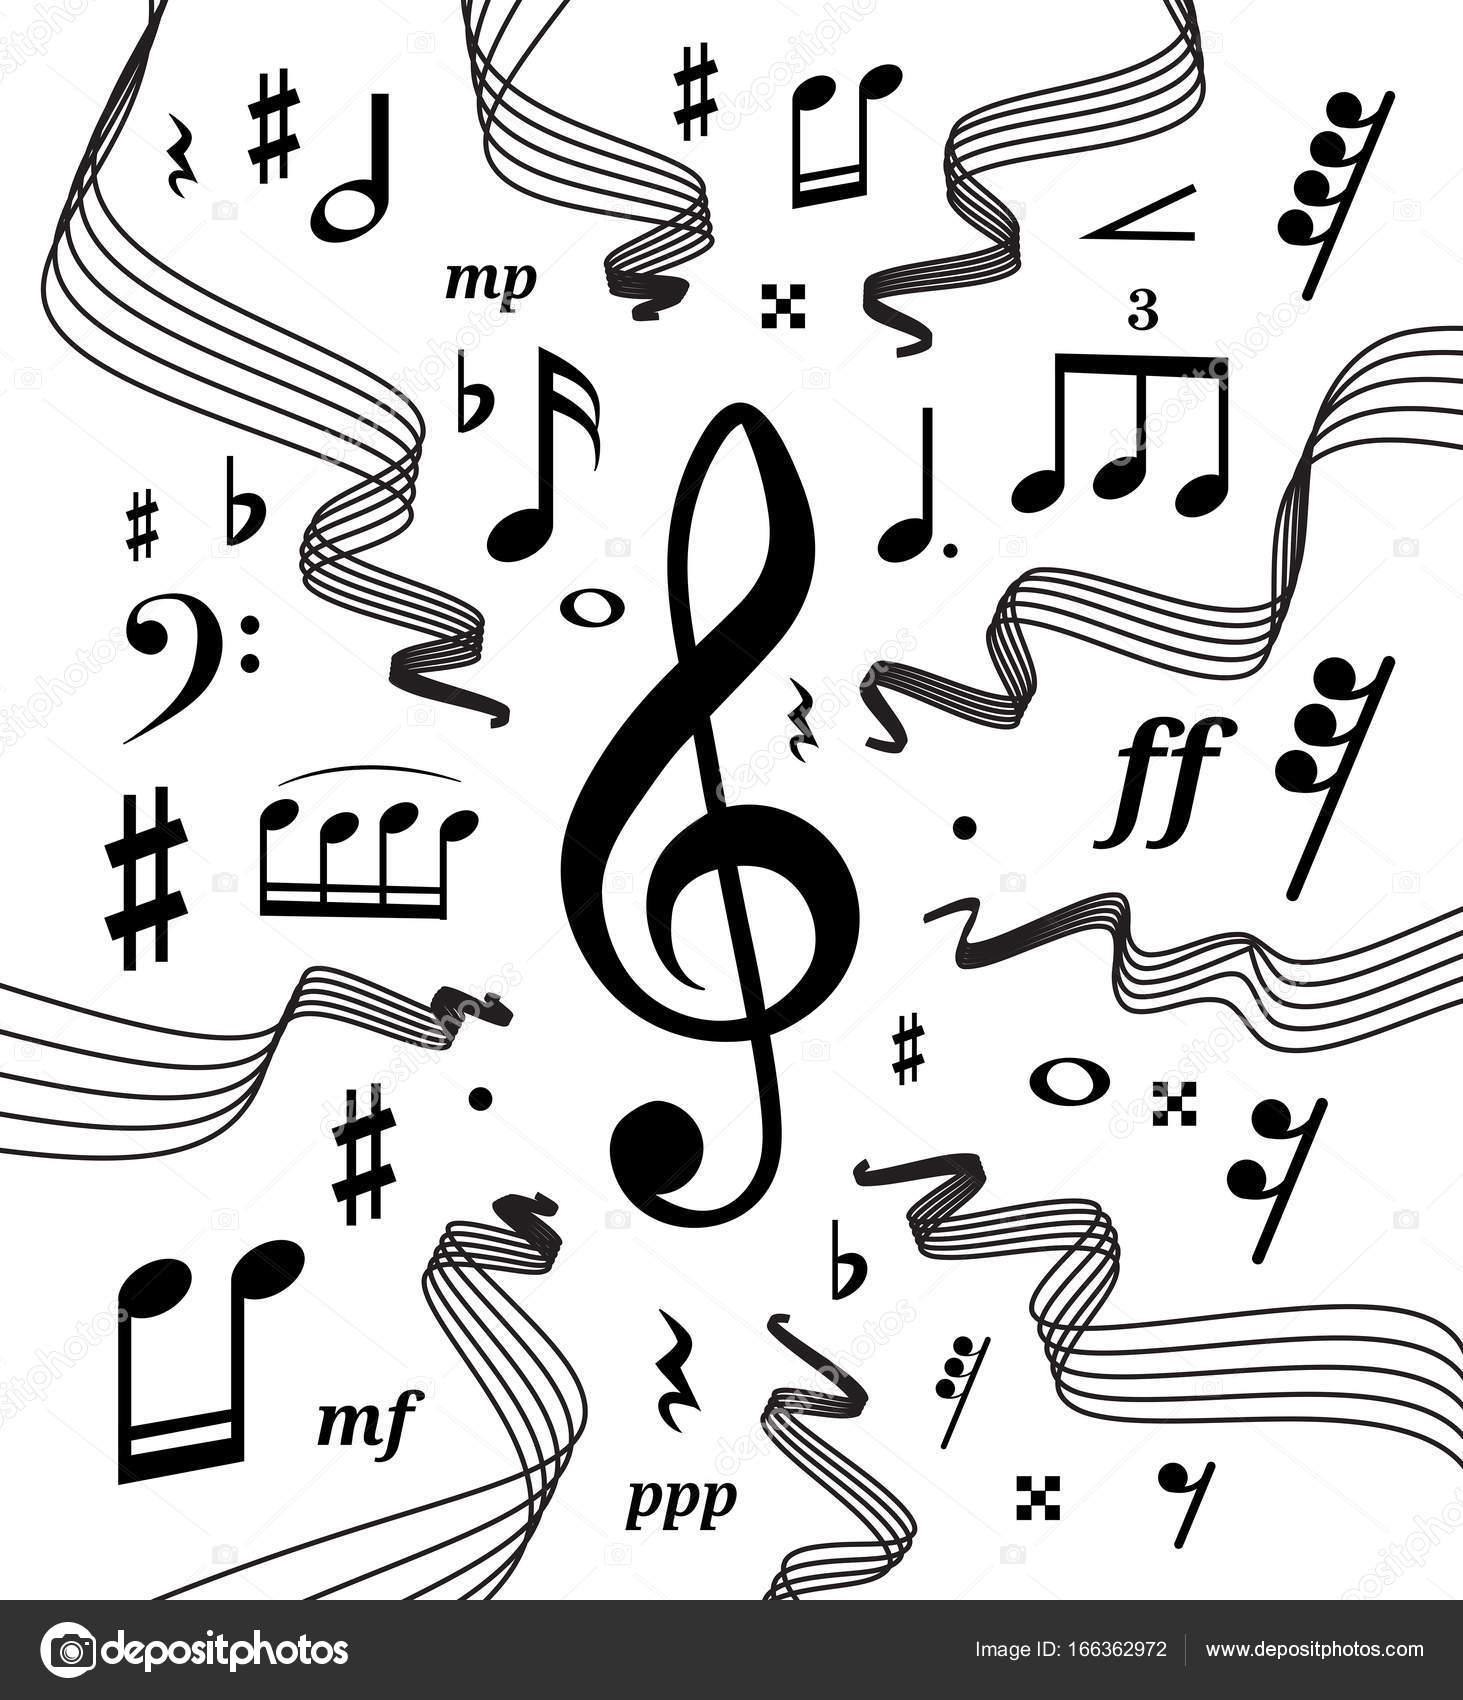 music symbols drawing at getdrawings com